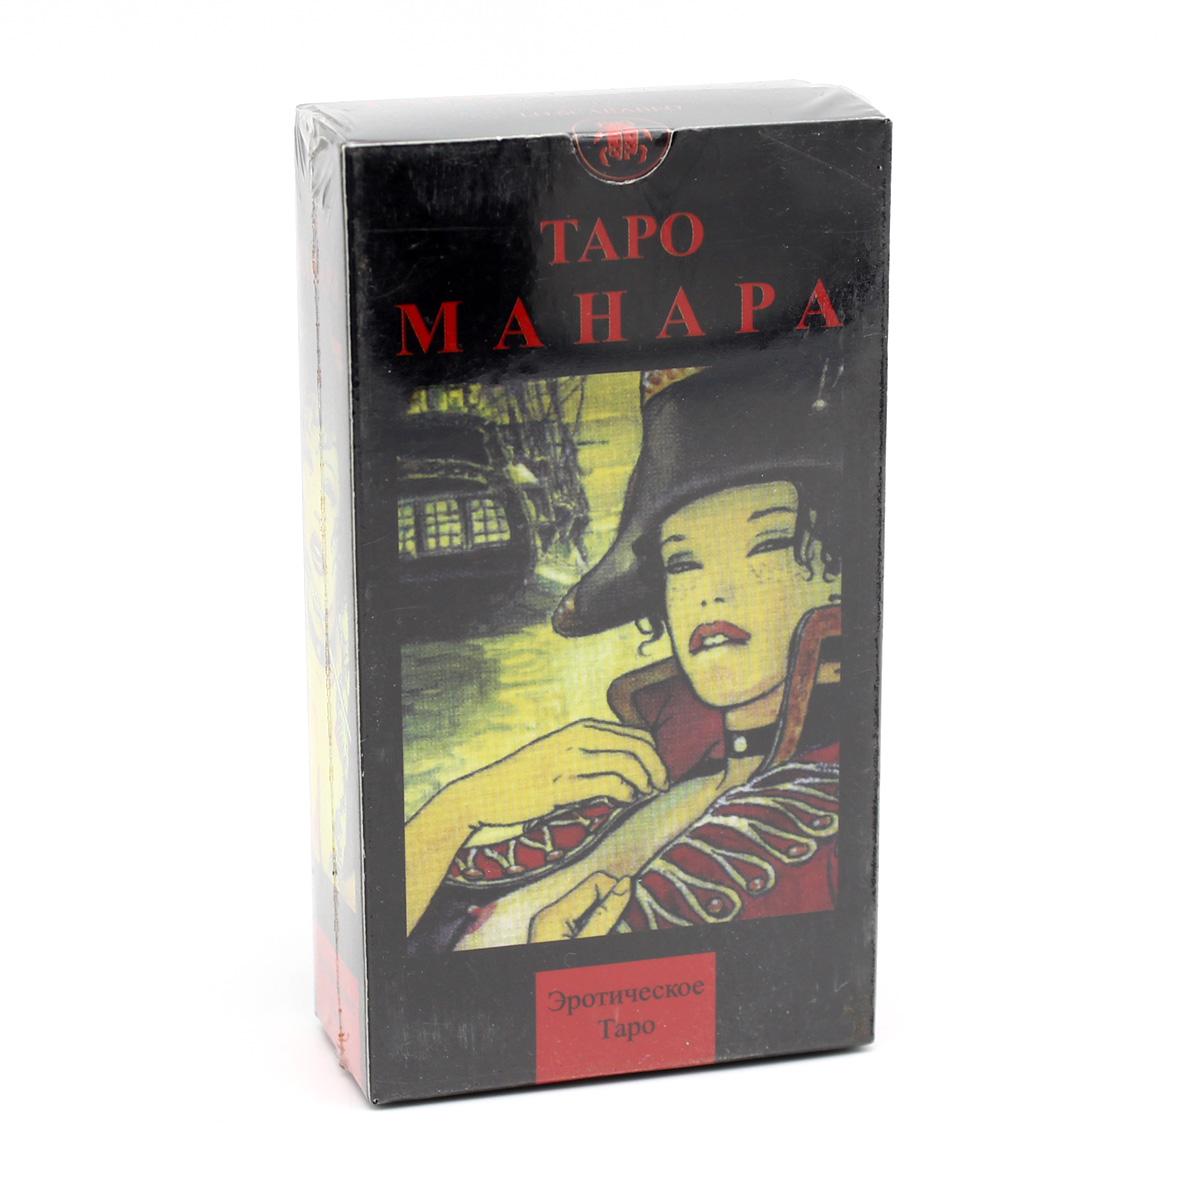 Таро Манара, ANKH, 78 карт, брошюра